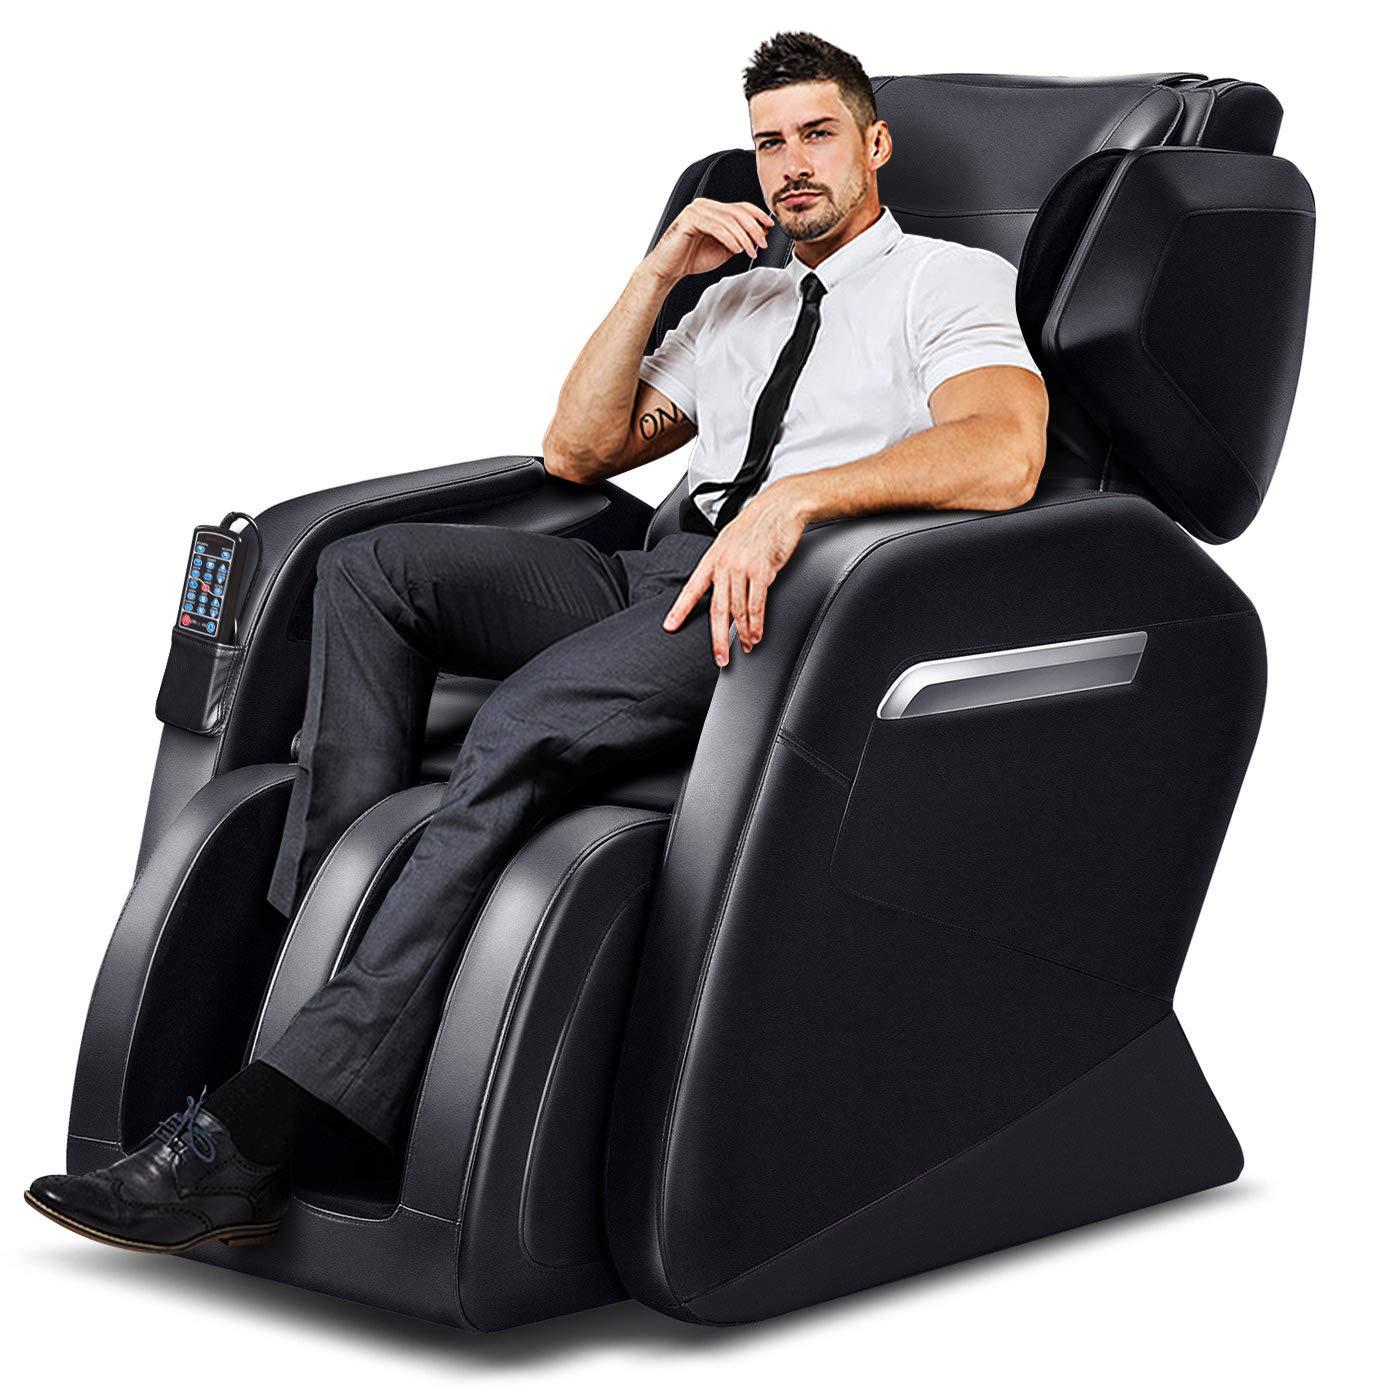 Gravity Massage Chair by Sinoluck